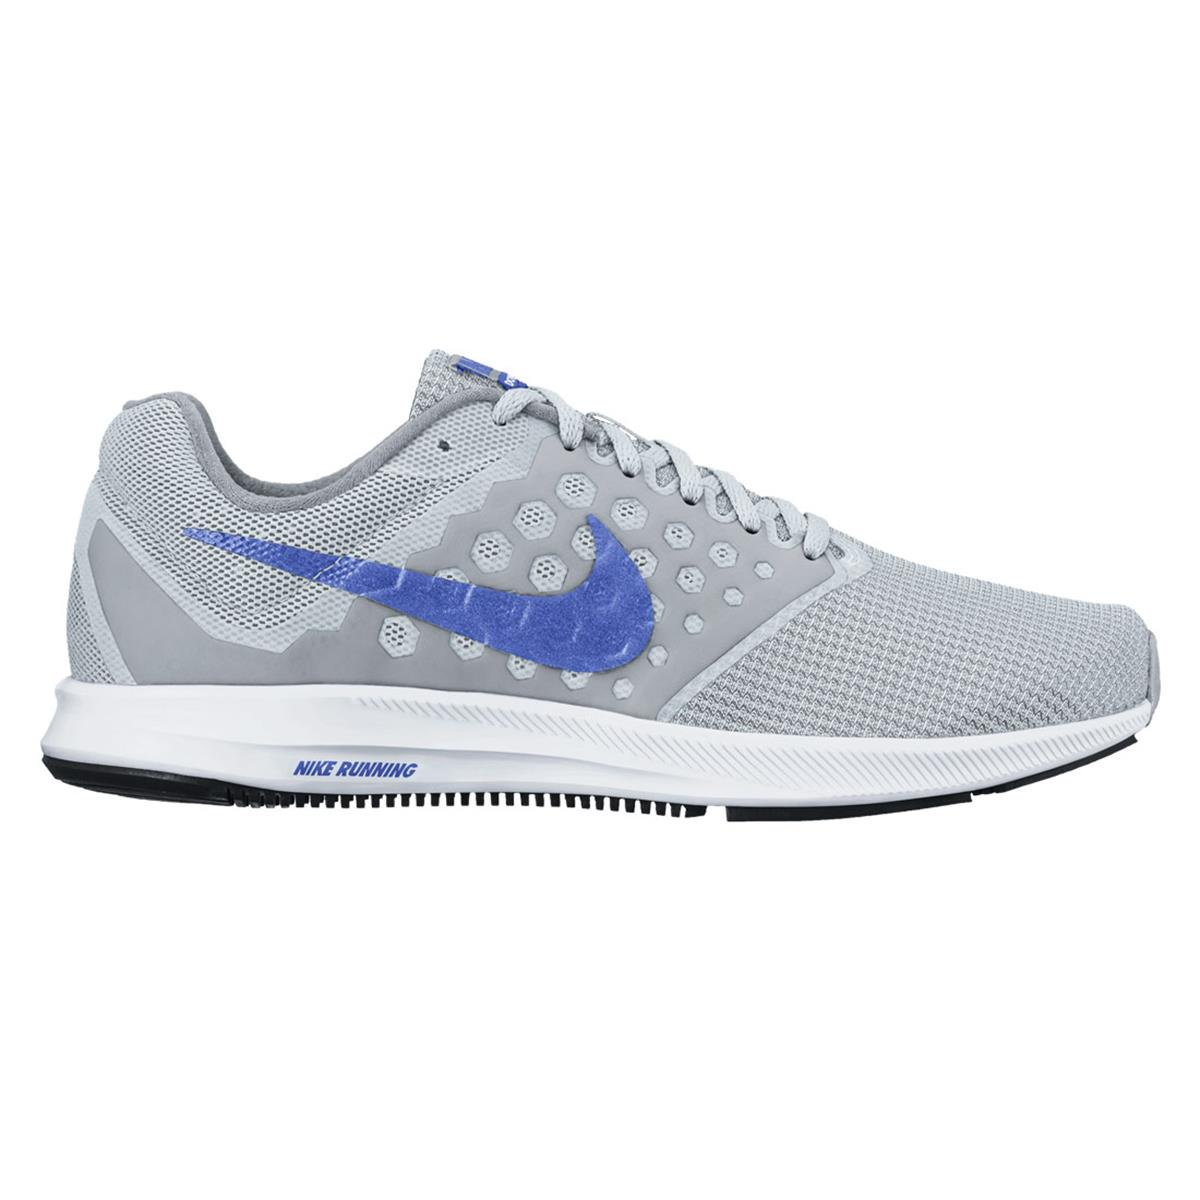 9d06a4066a7d9 Nike Downshifter 7 Womens Running Shoes (Grey-Blue ...